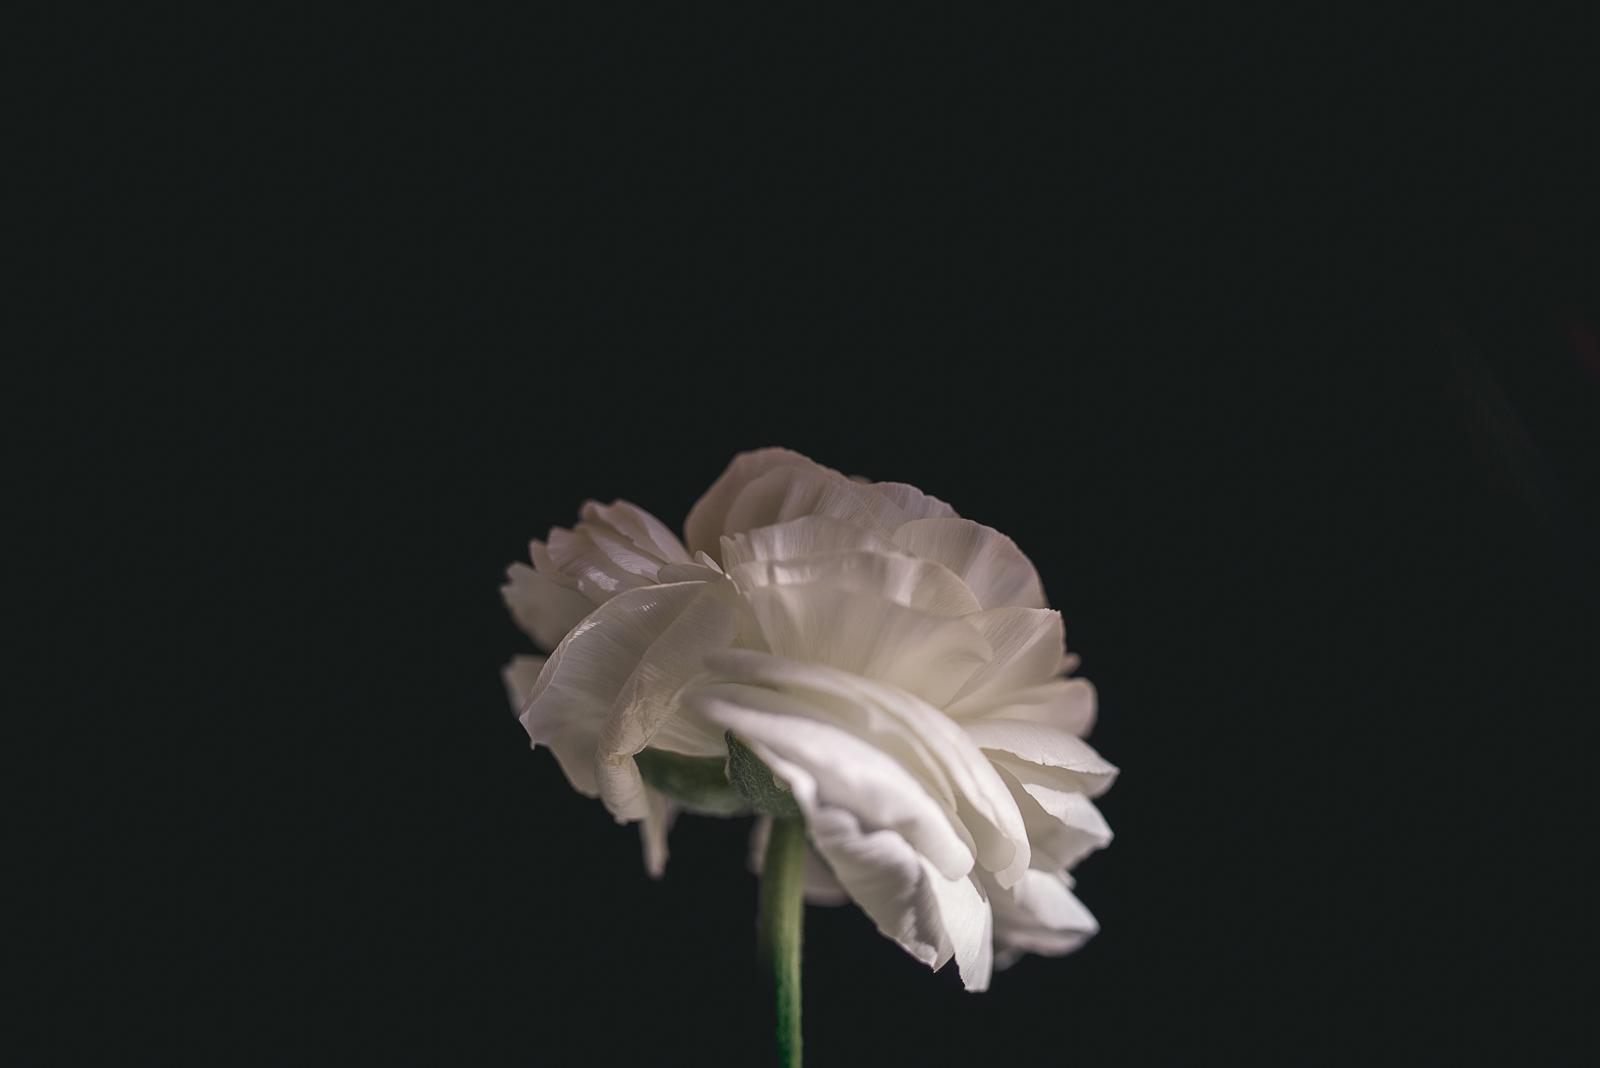 floral photograph by Elle Walker